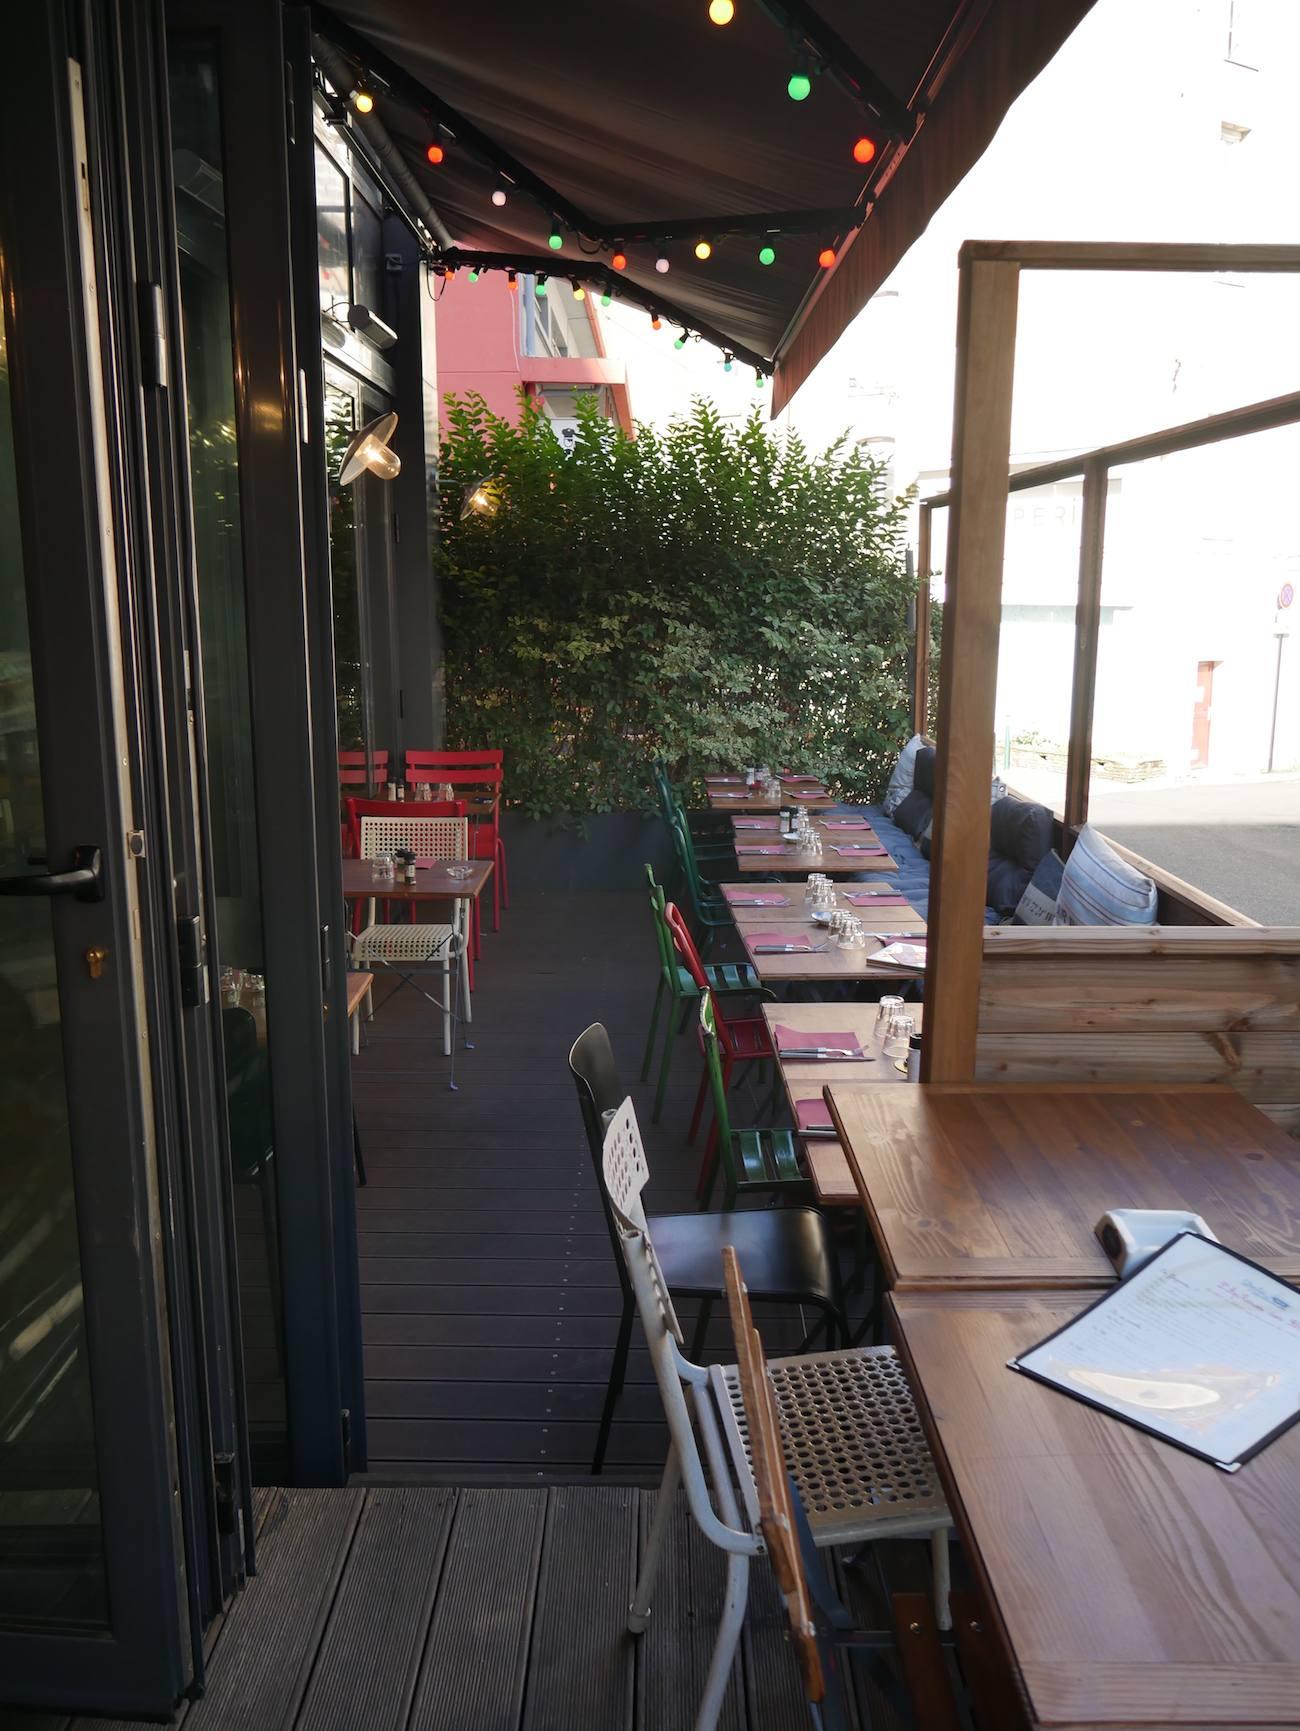 Restaurant Nantes - Les fils à maman - blog Nolwenn 2